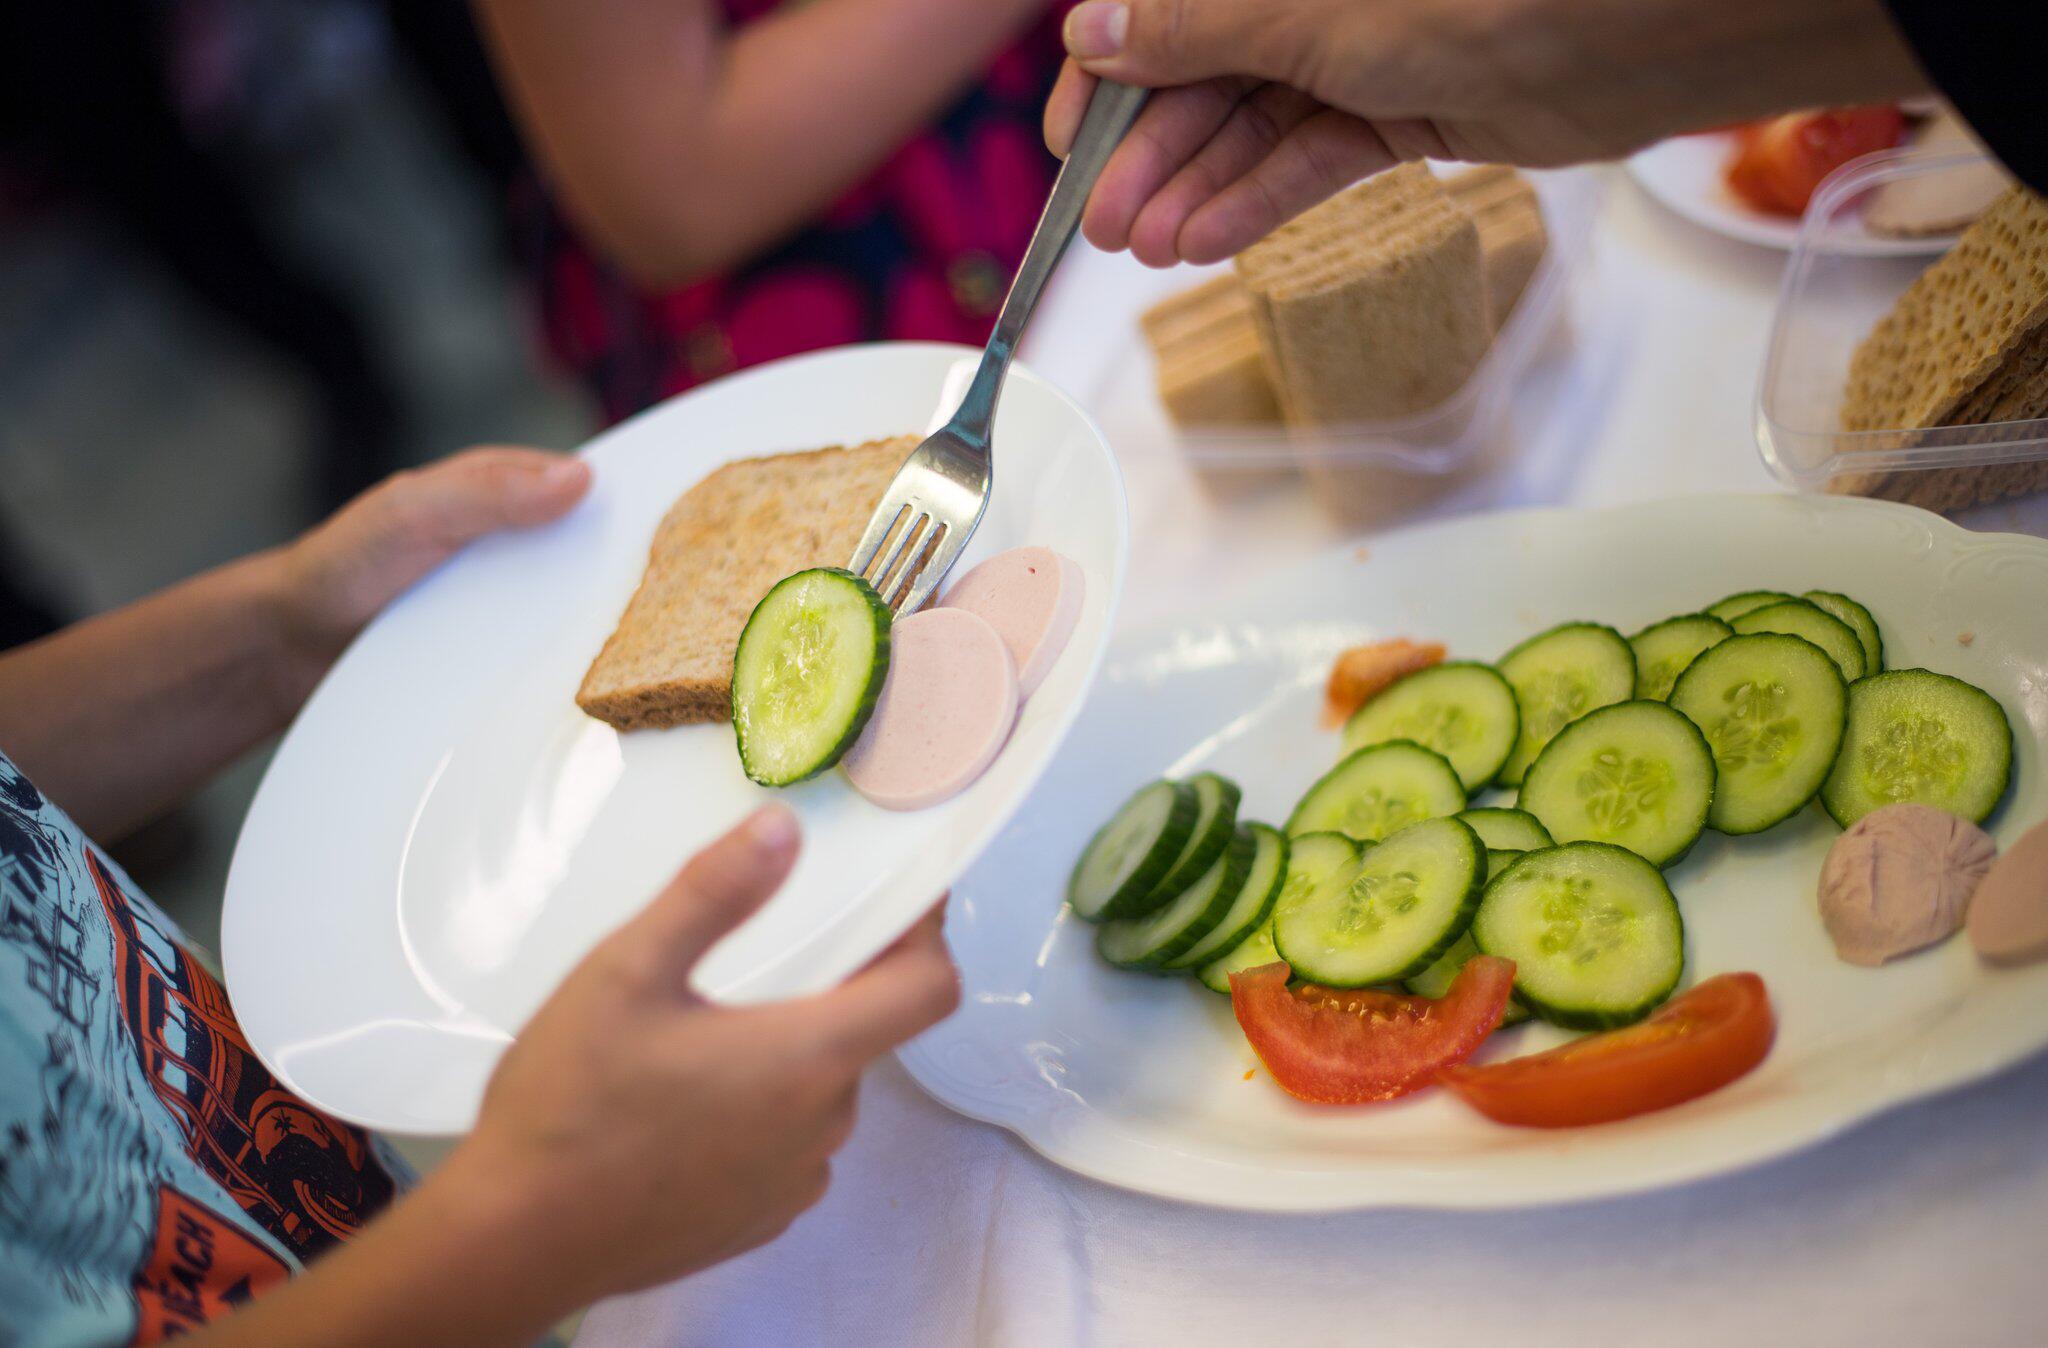 Bild zu Initiative brotZeit bietet kostenloses Frühstück